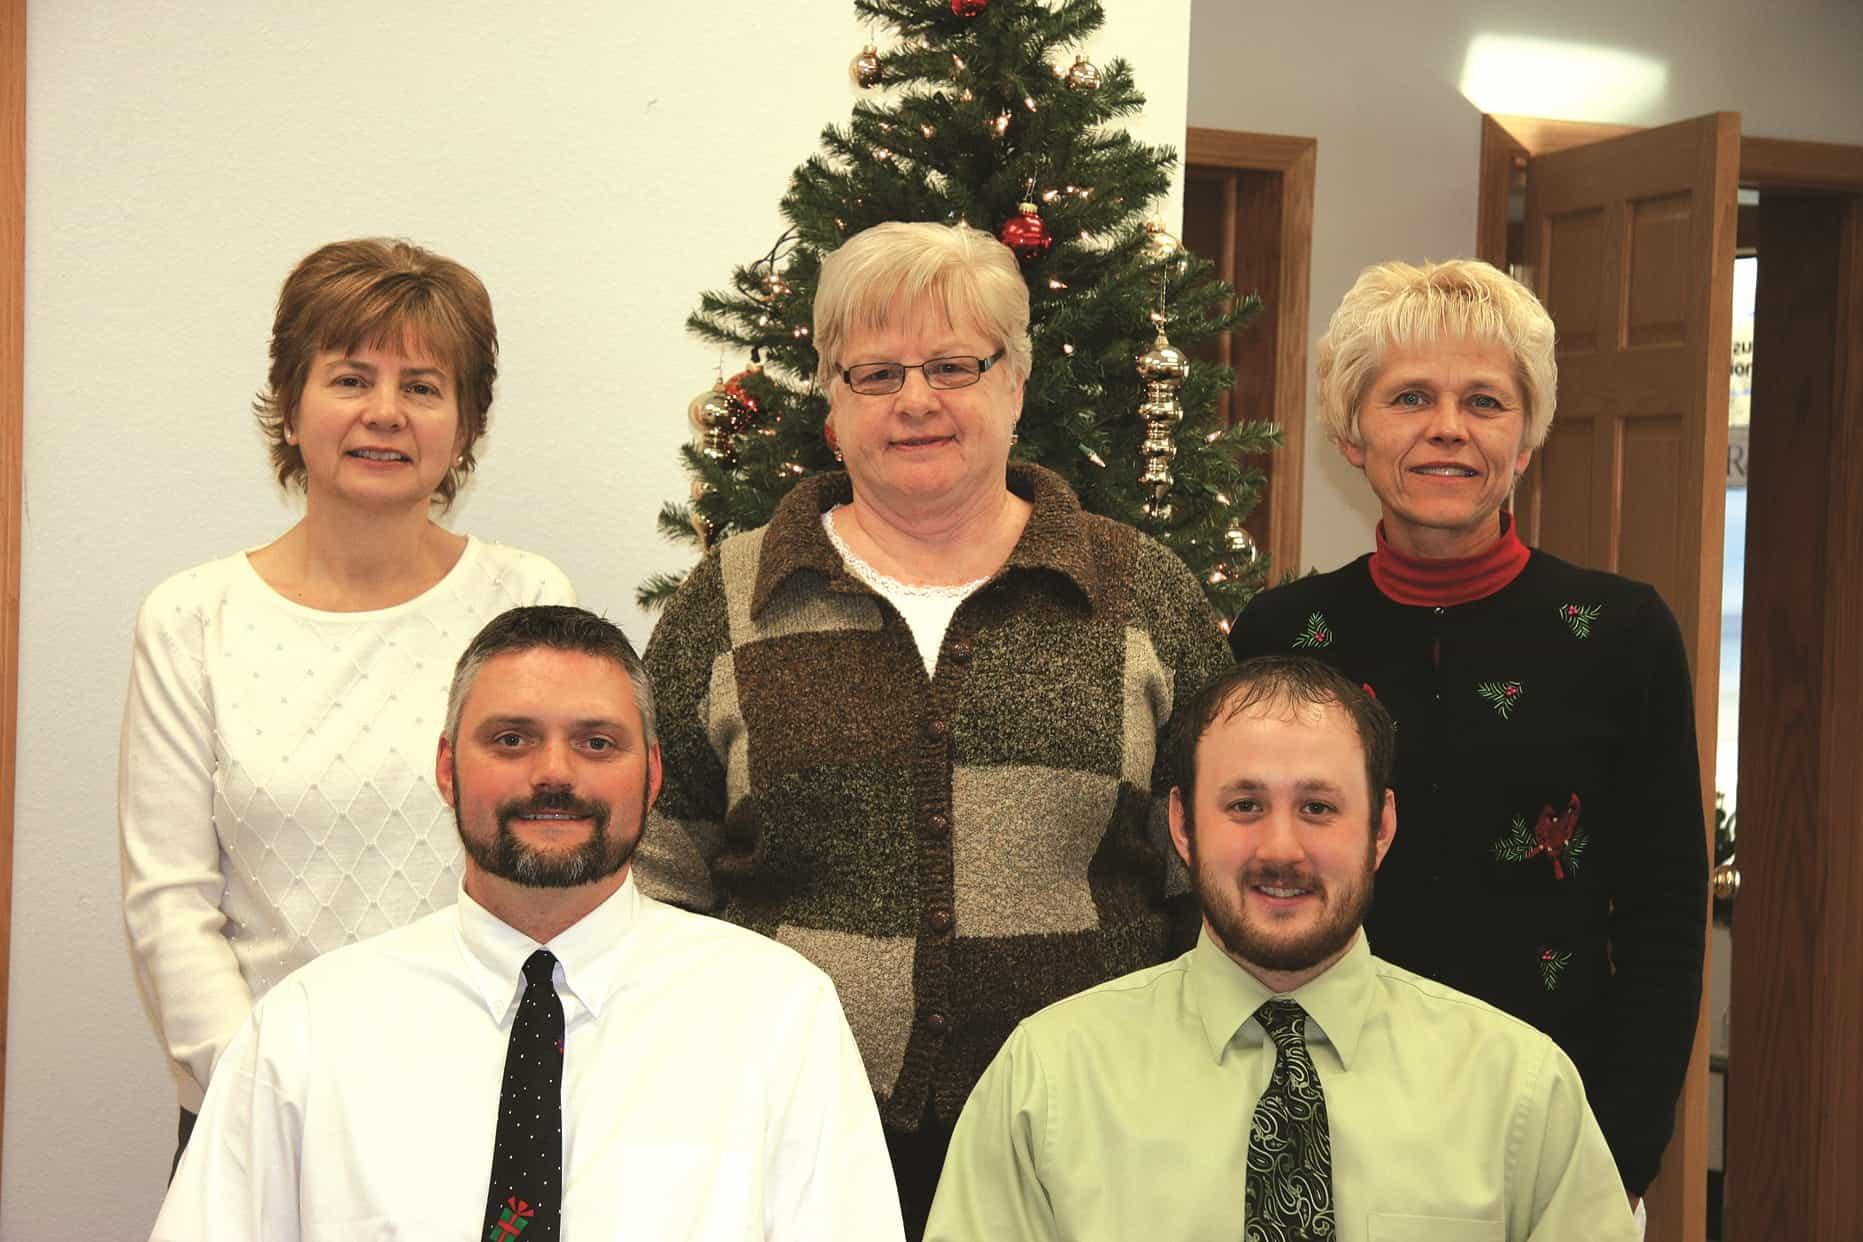 Eitzen Banking & Insurance - Caledonia Staff